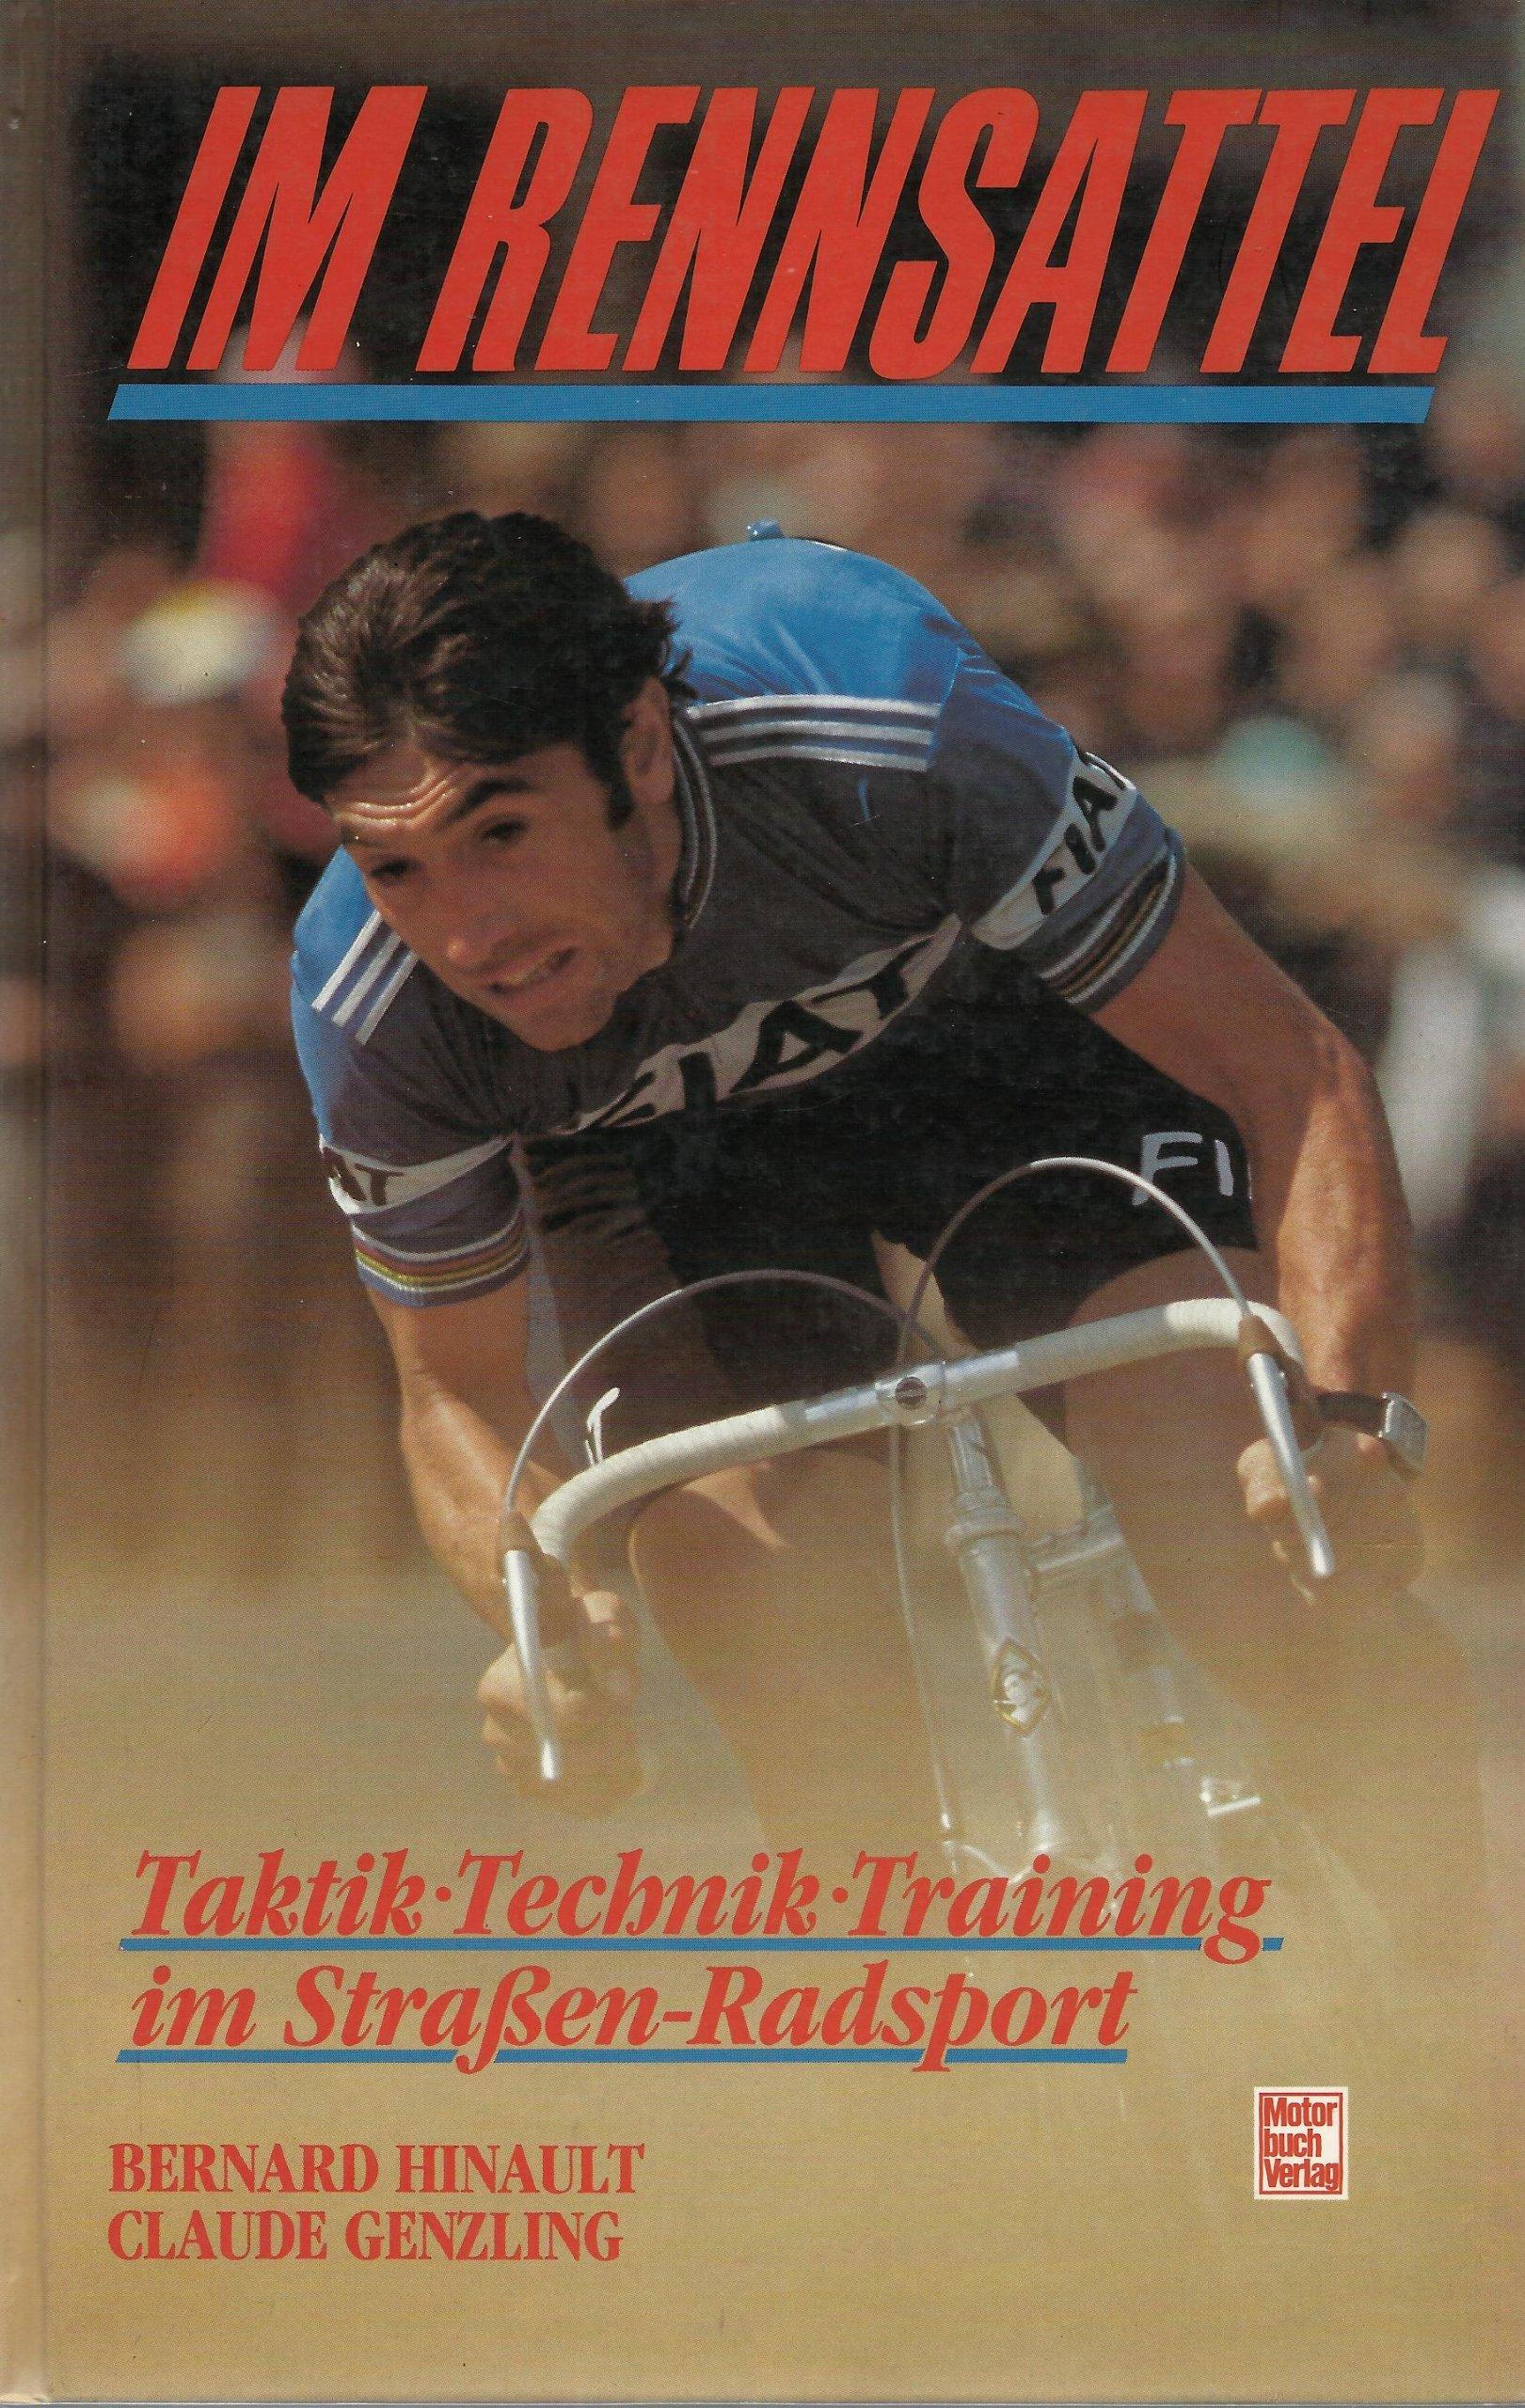 Im Rennsattel. Technik, Taktik, Training im Strassen-Radsport